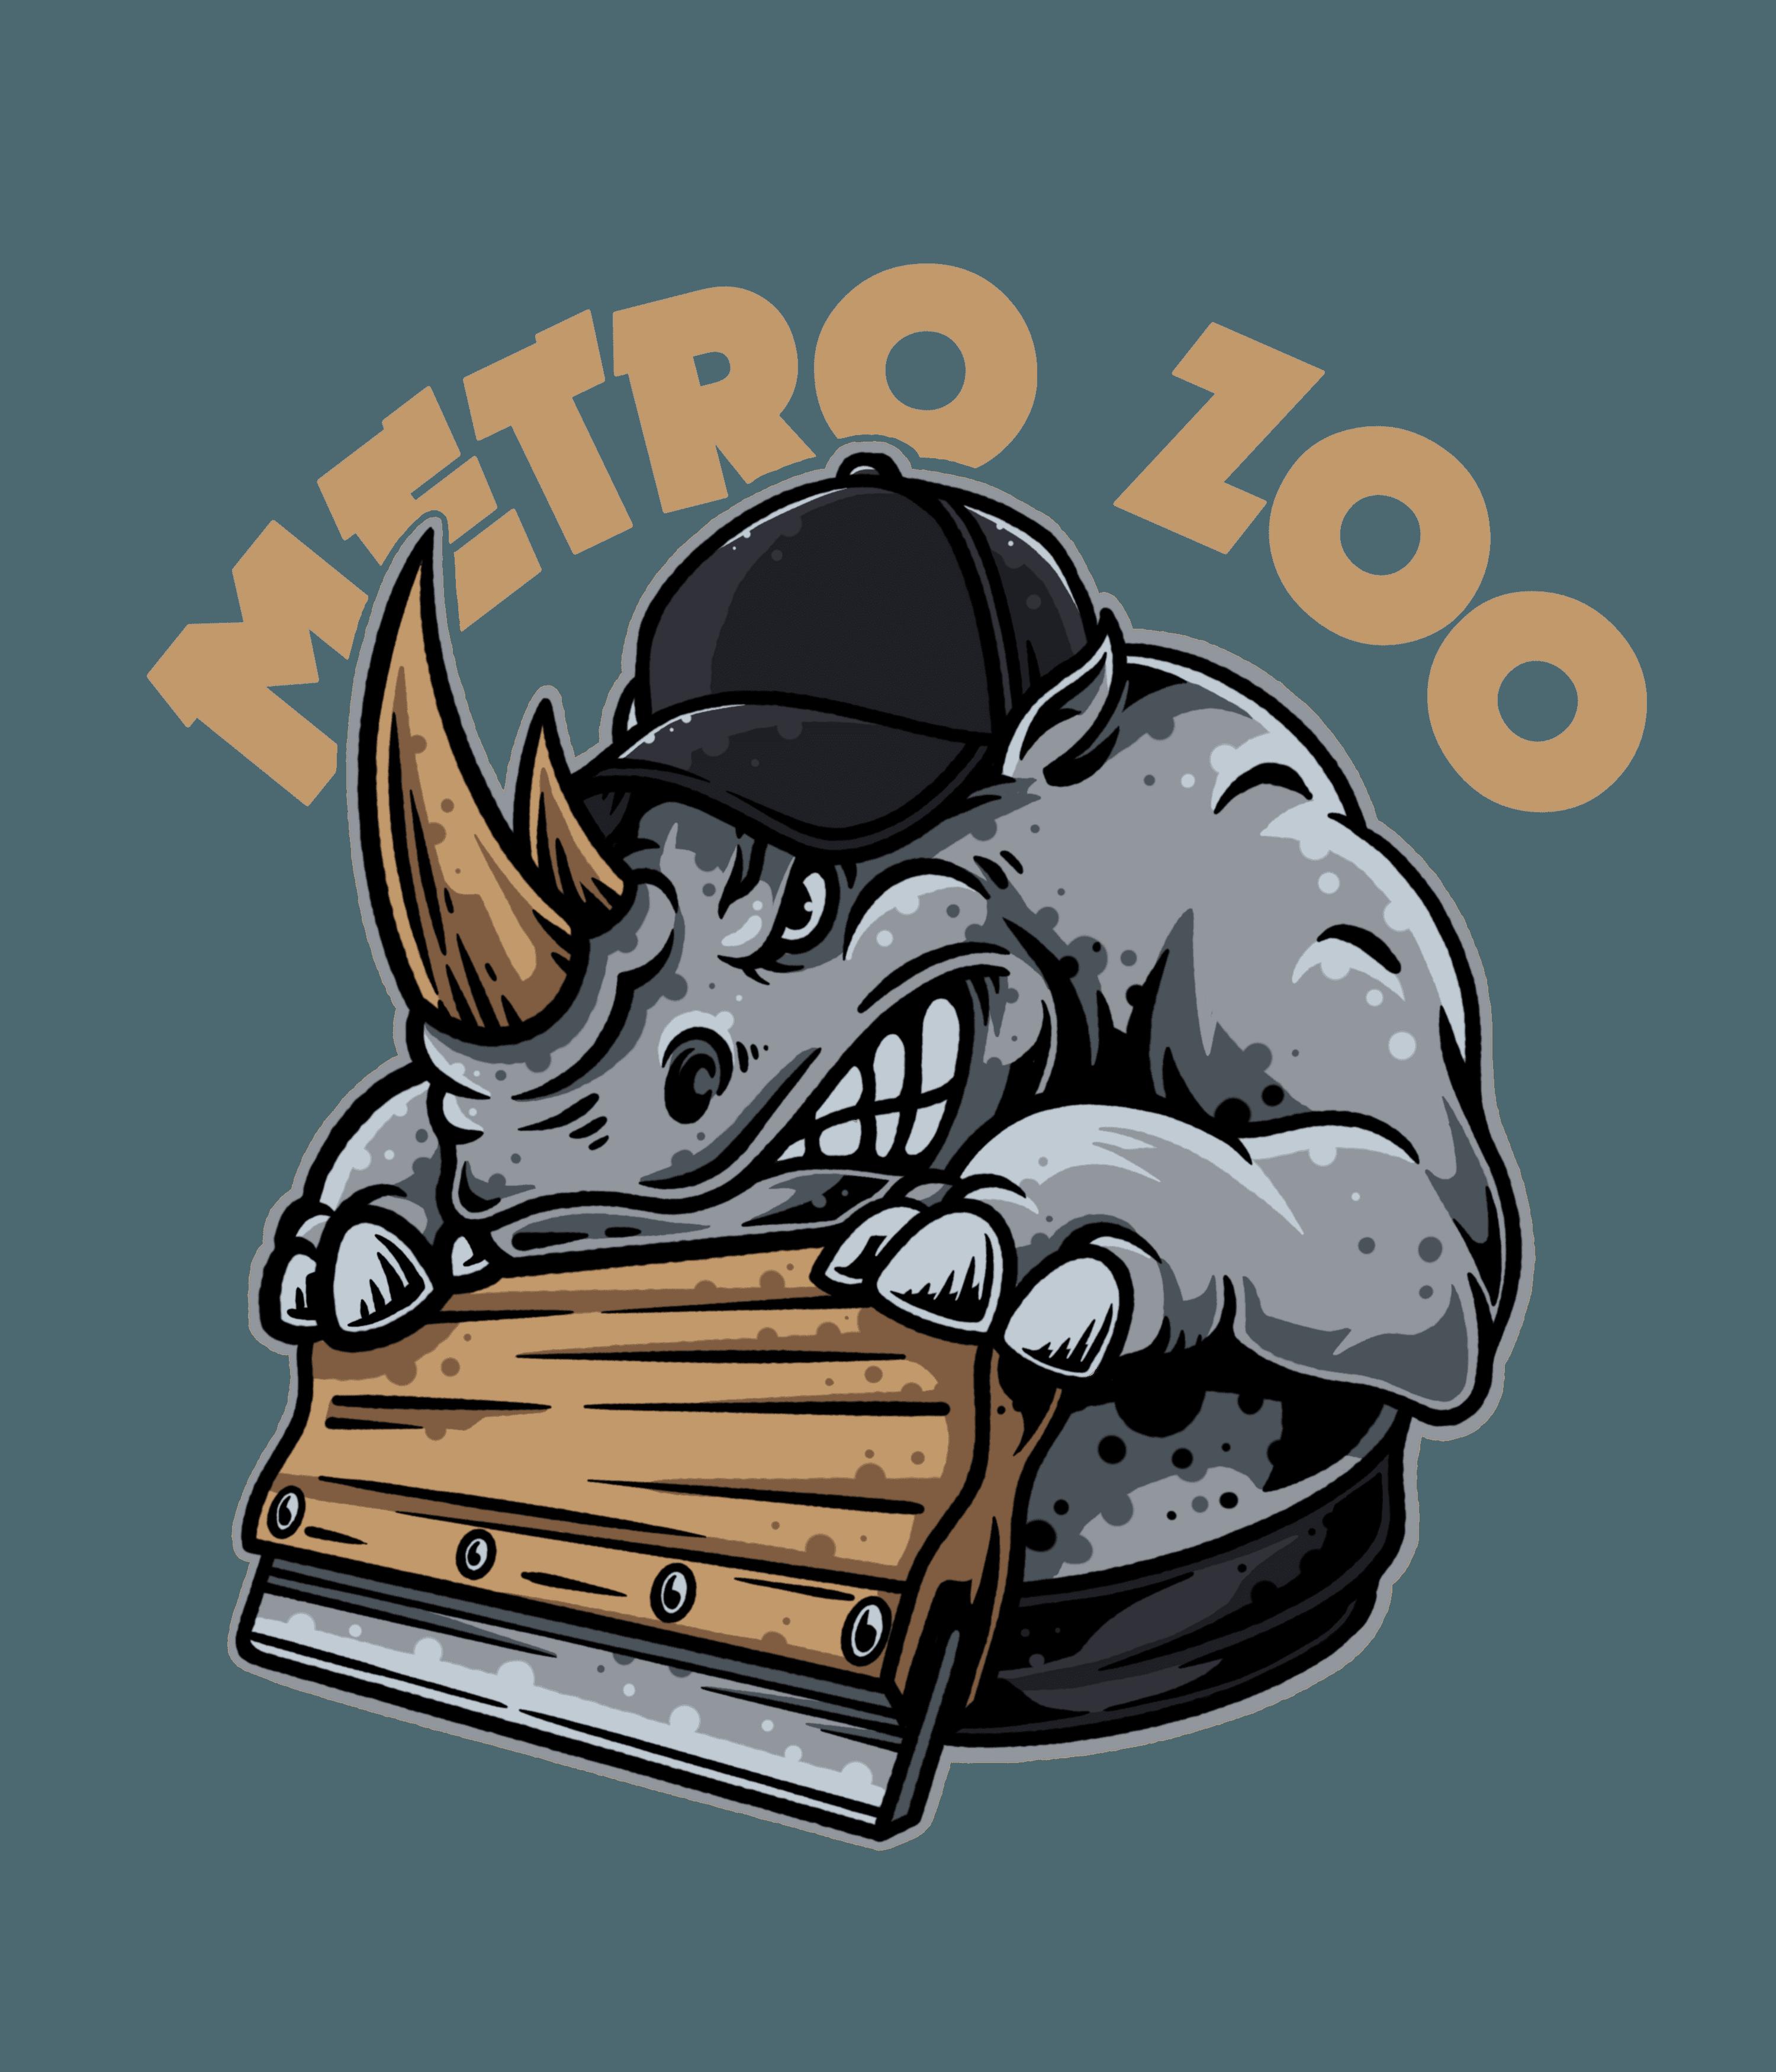 Metro Zooo Printz